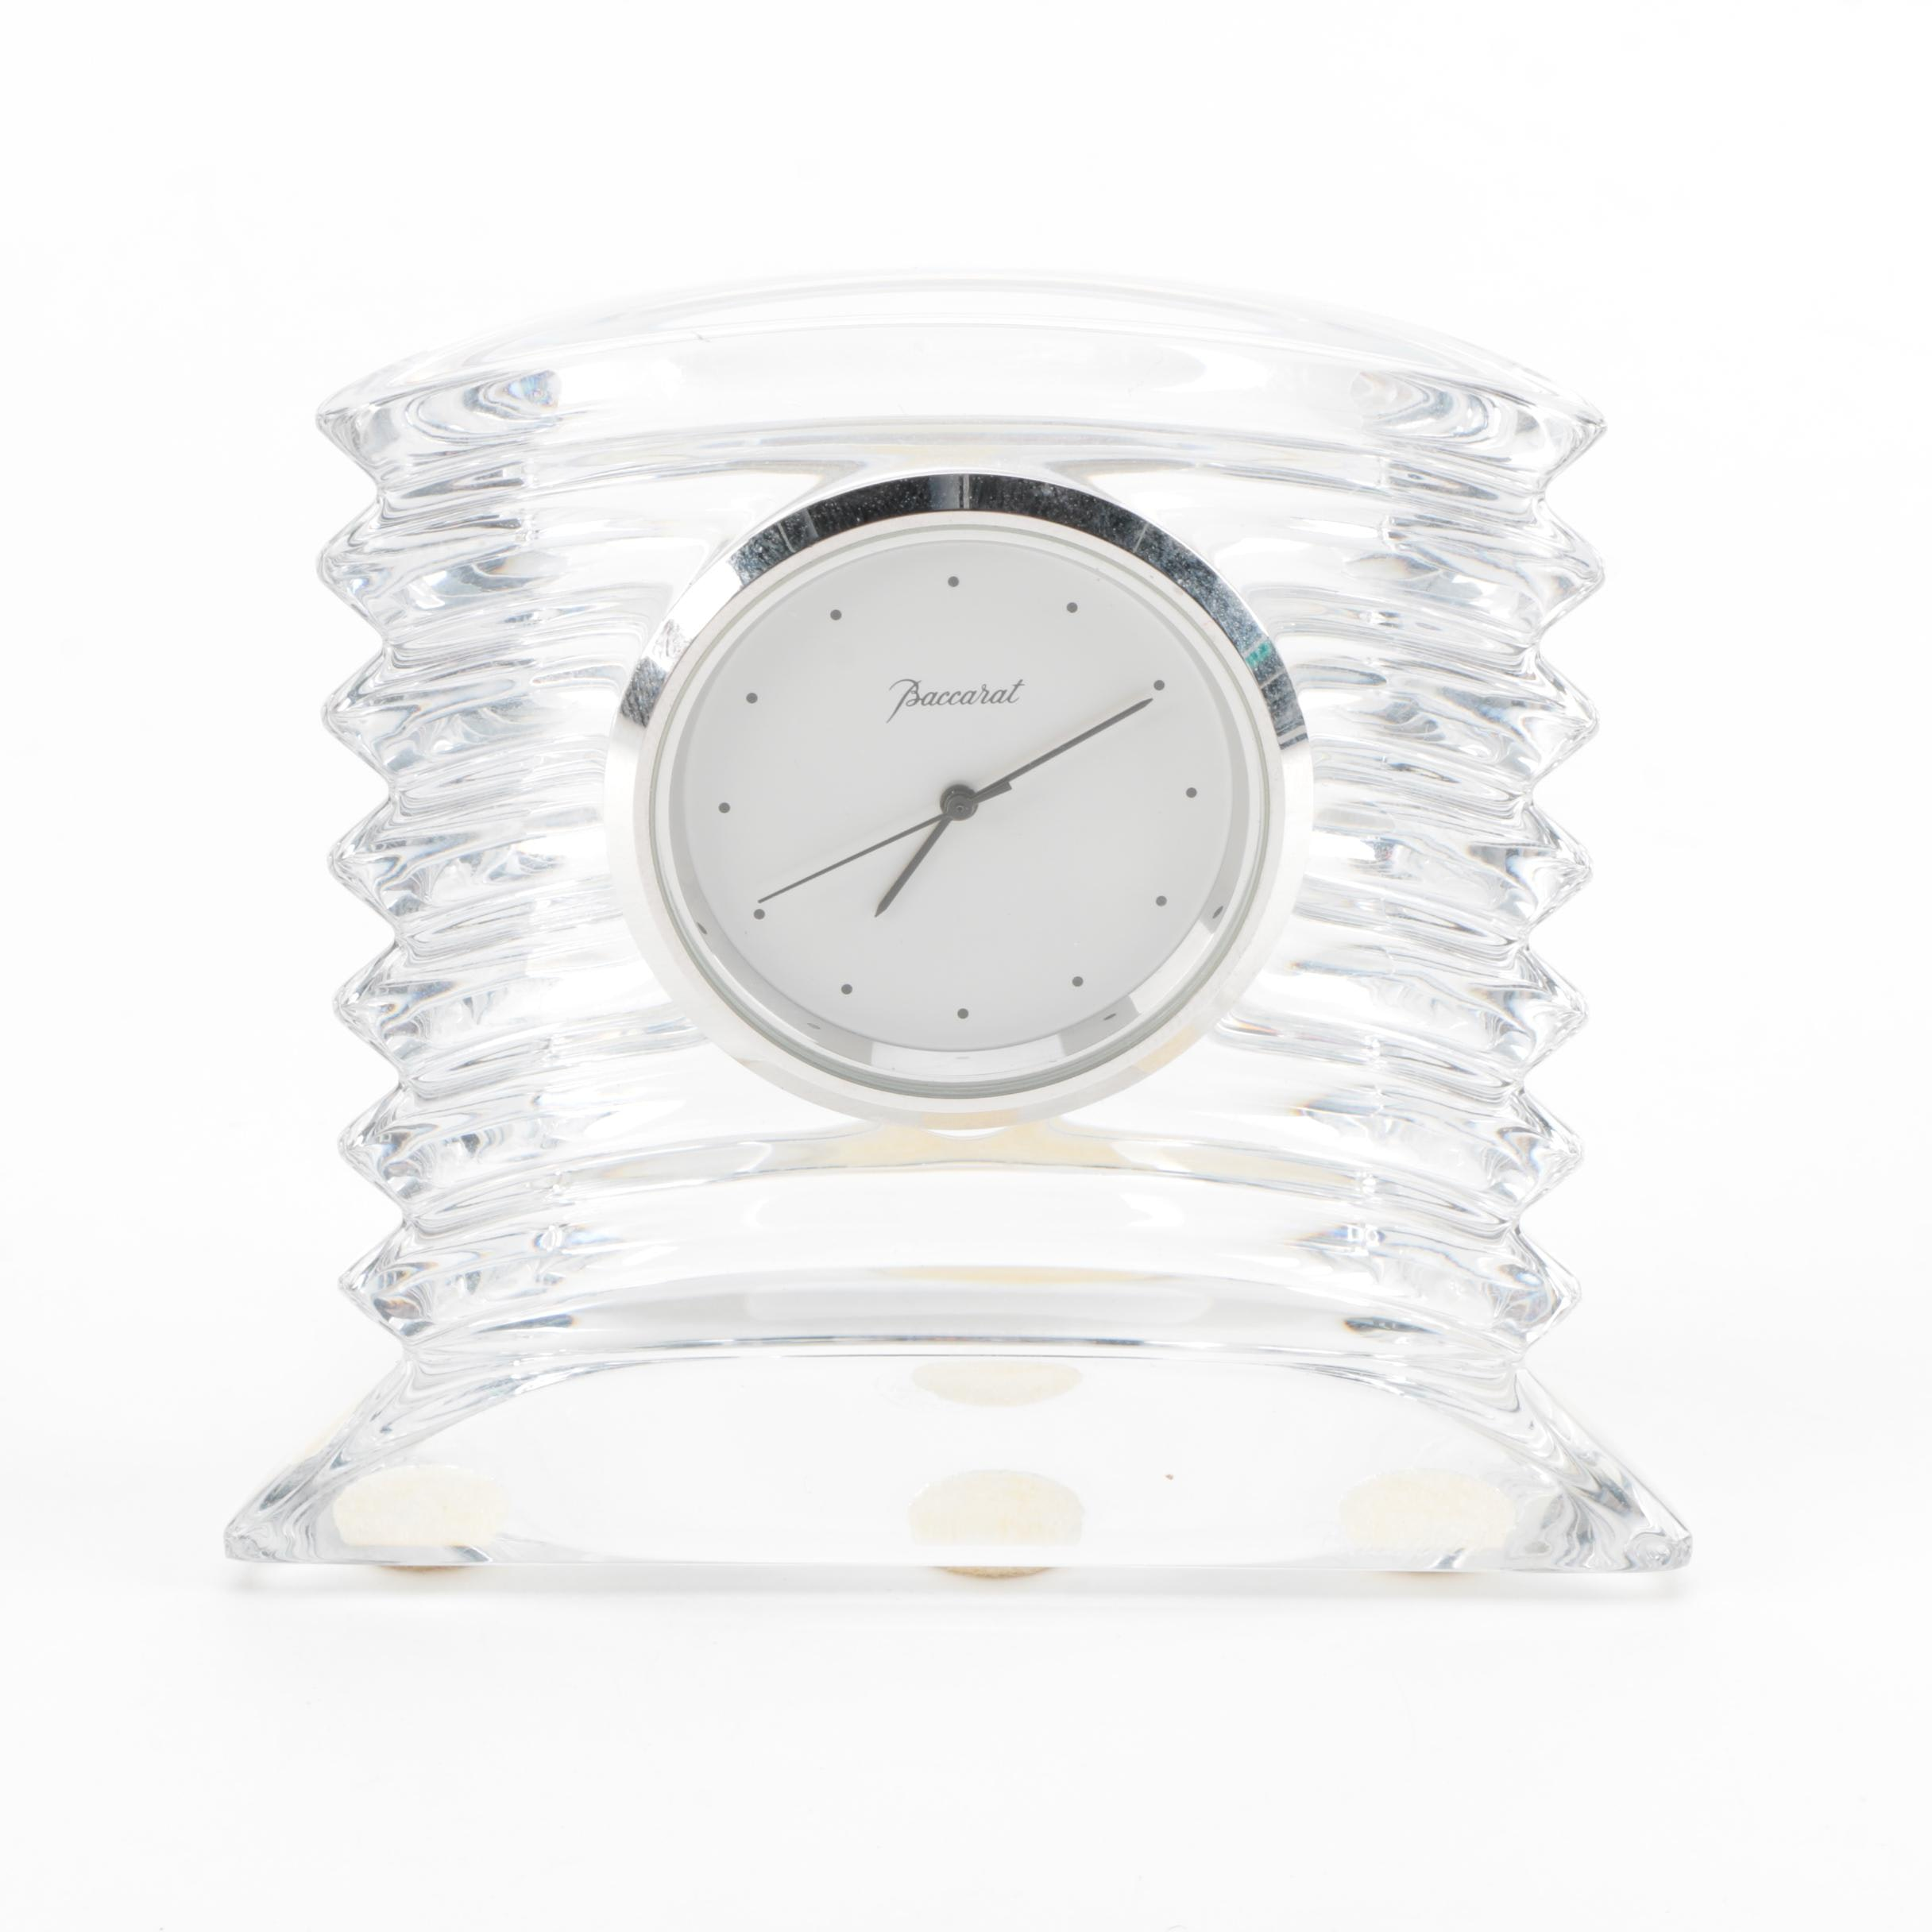 Baccarat Crystal Desk Clock